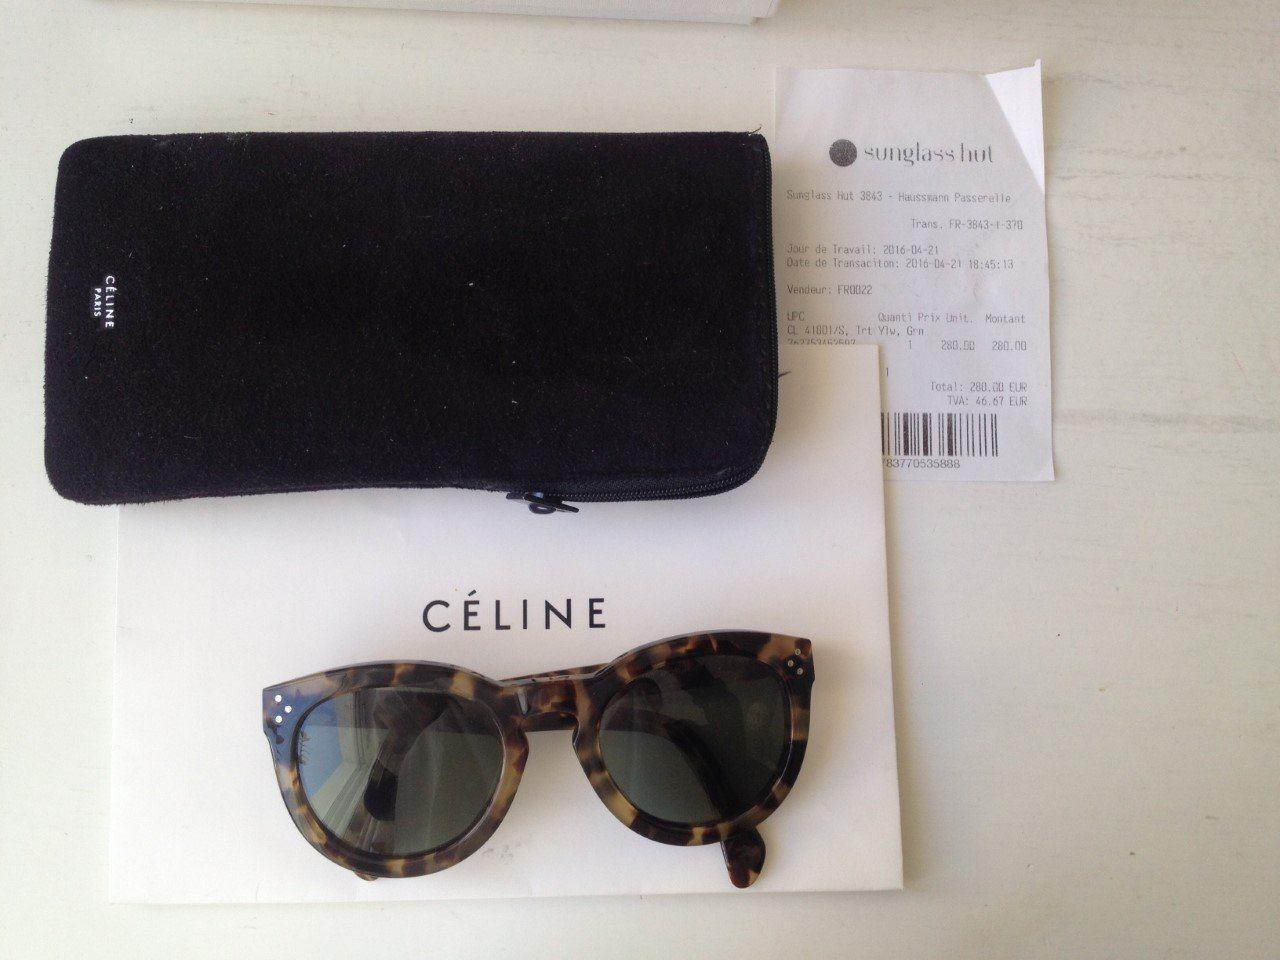 a220f99d24f Céline solglasögon modell preppy havana turtle (342989188) ᐈ Köp på ...